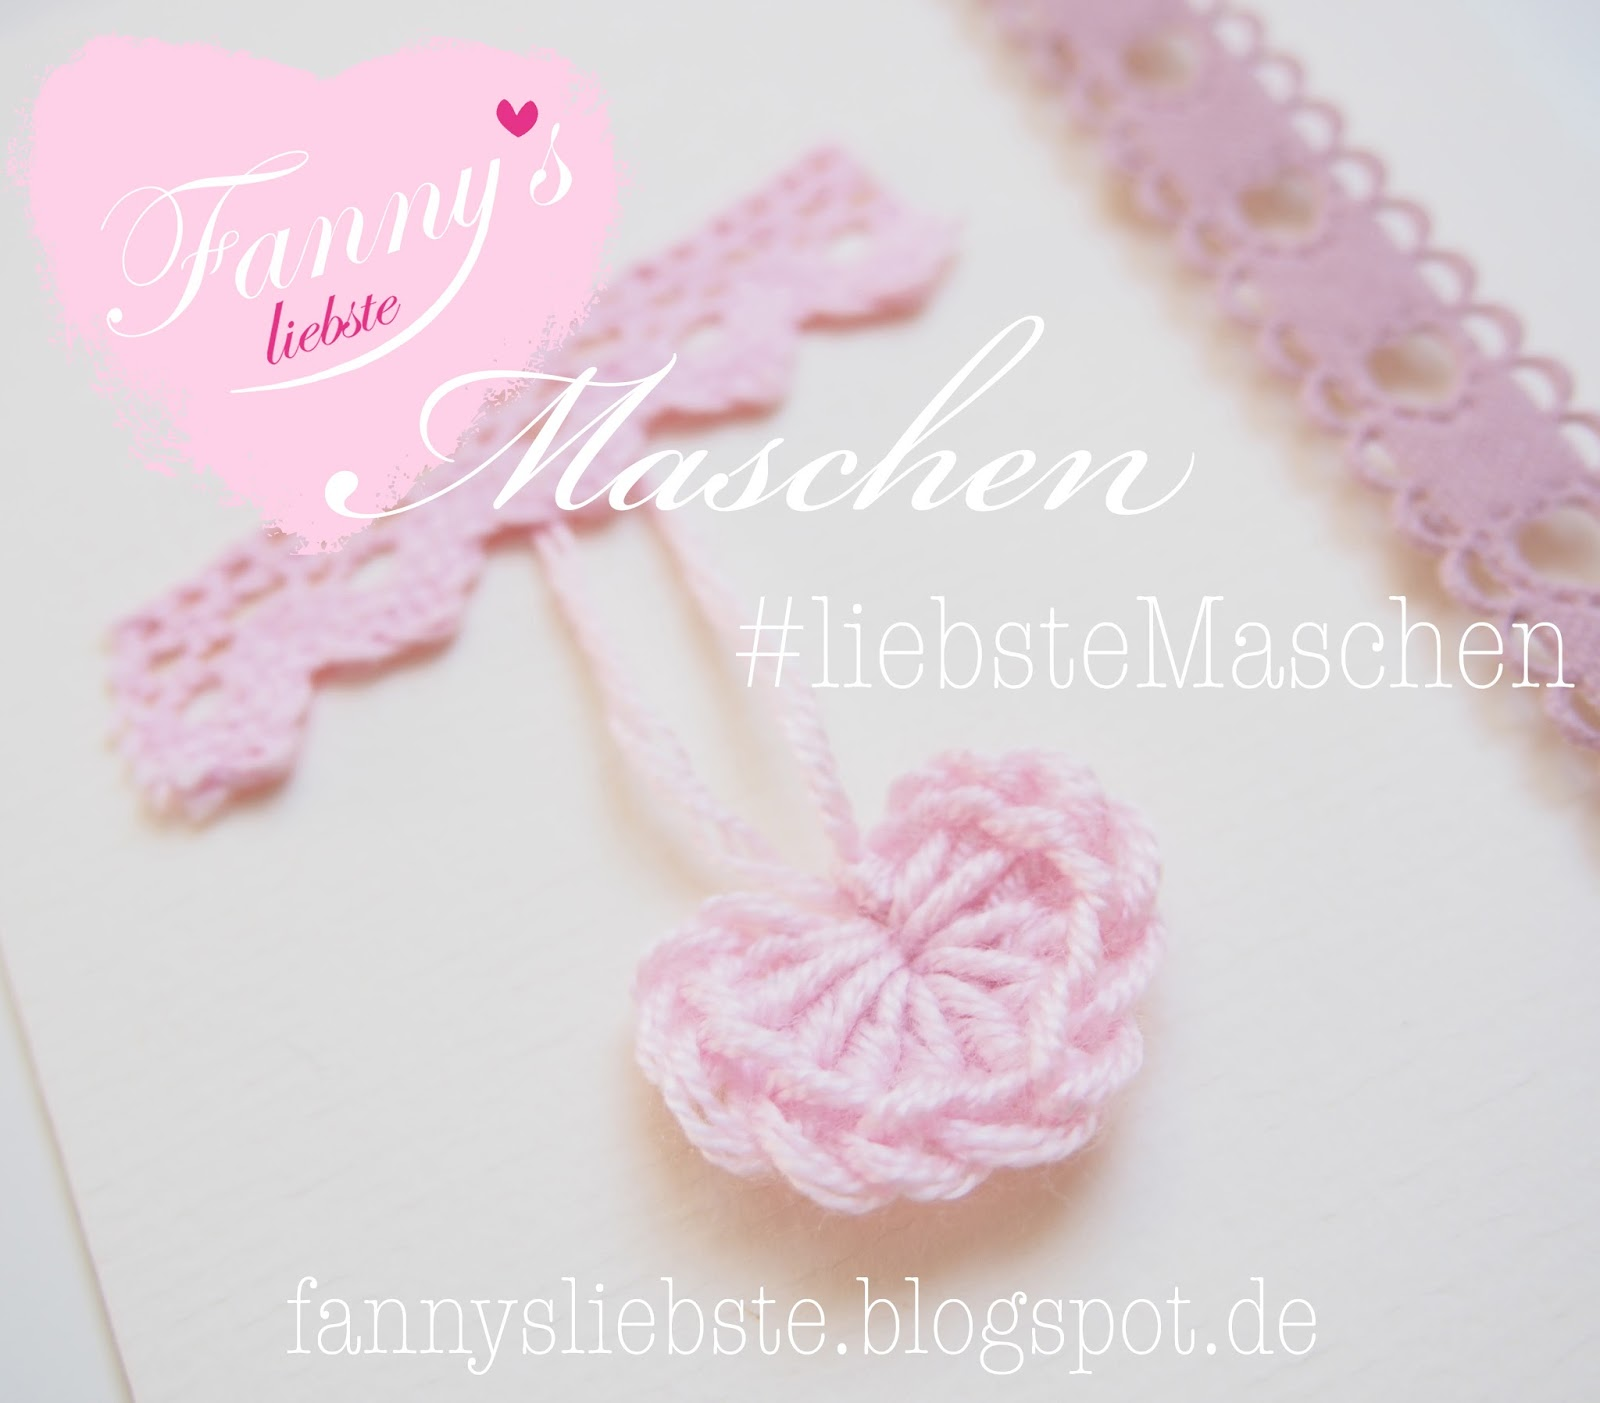 Fanny's liebste Maschen